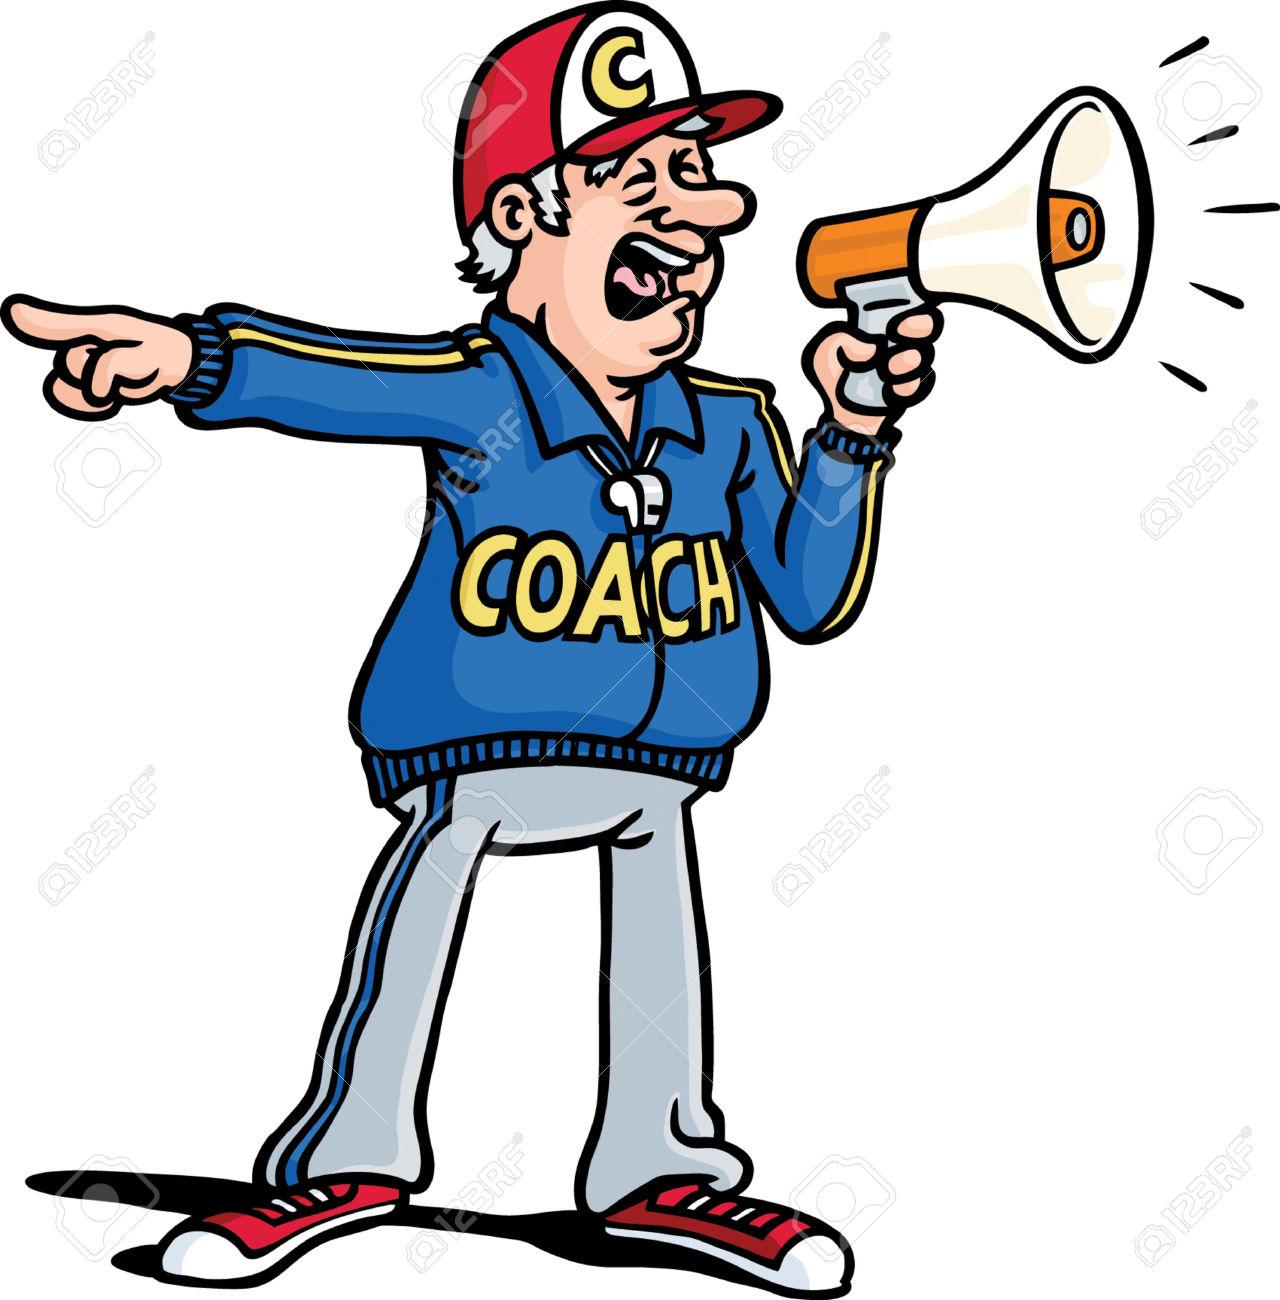 Coach clip art.